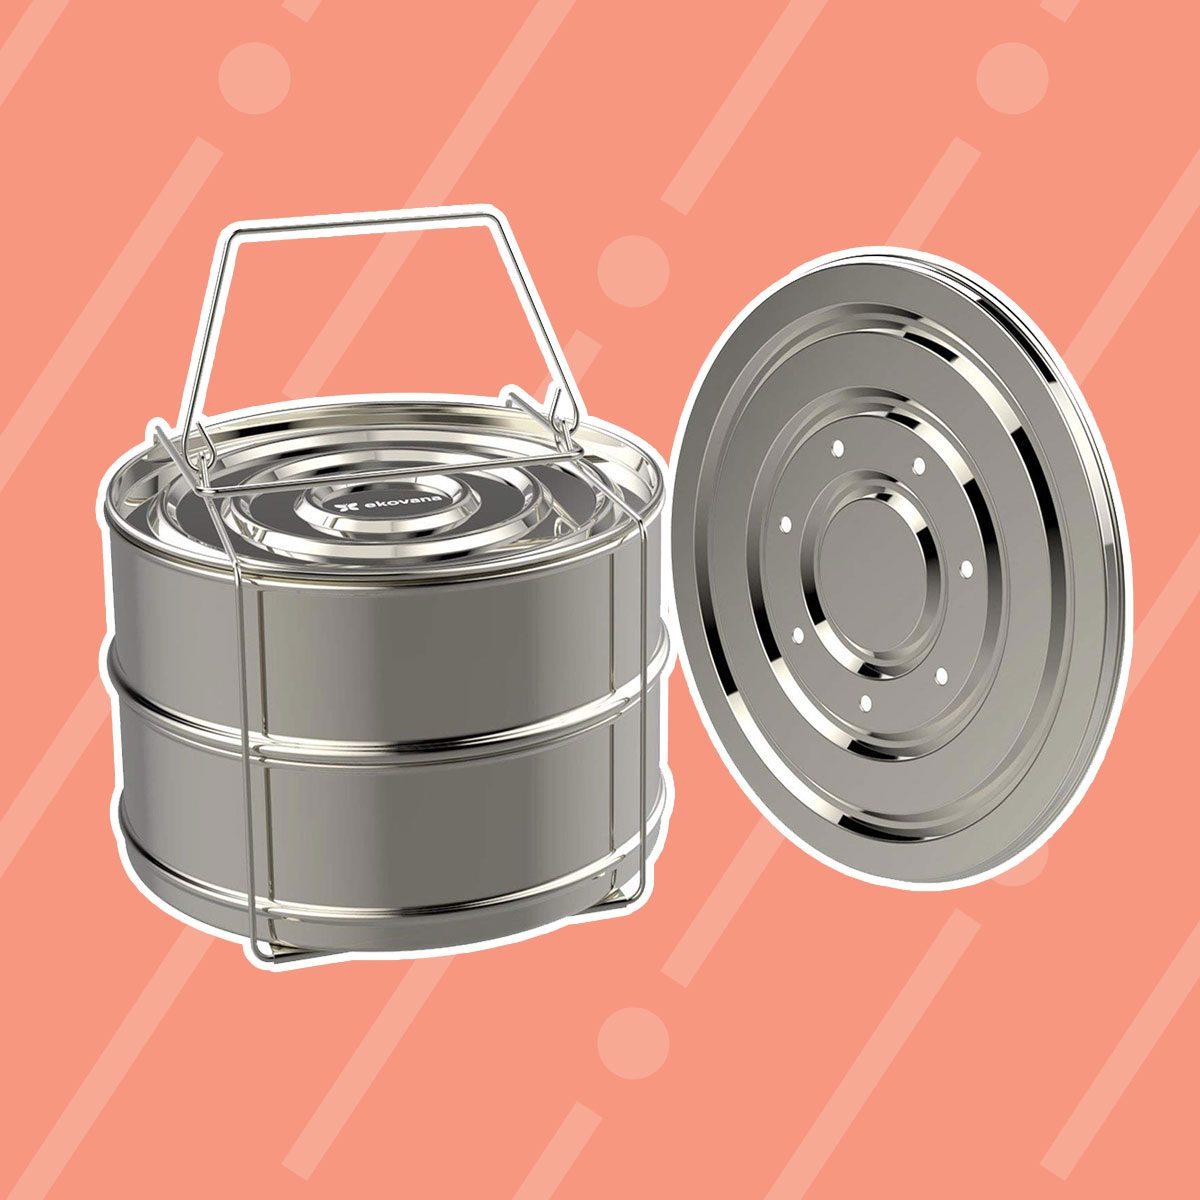 instant pot accessories, steamer baskets